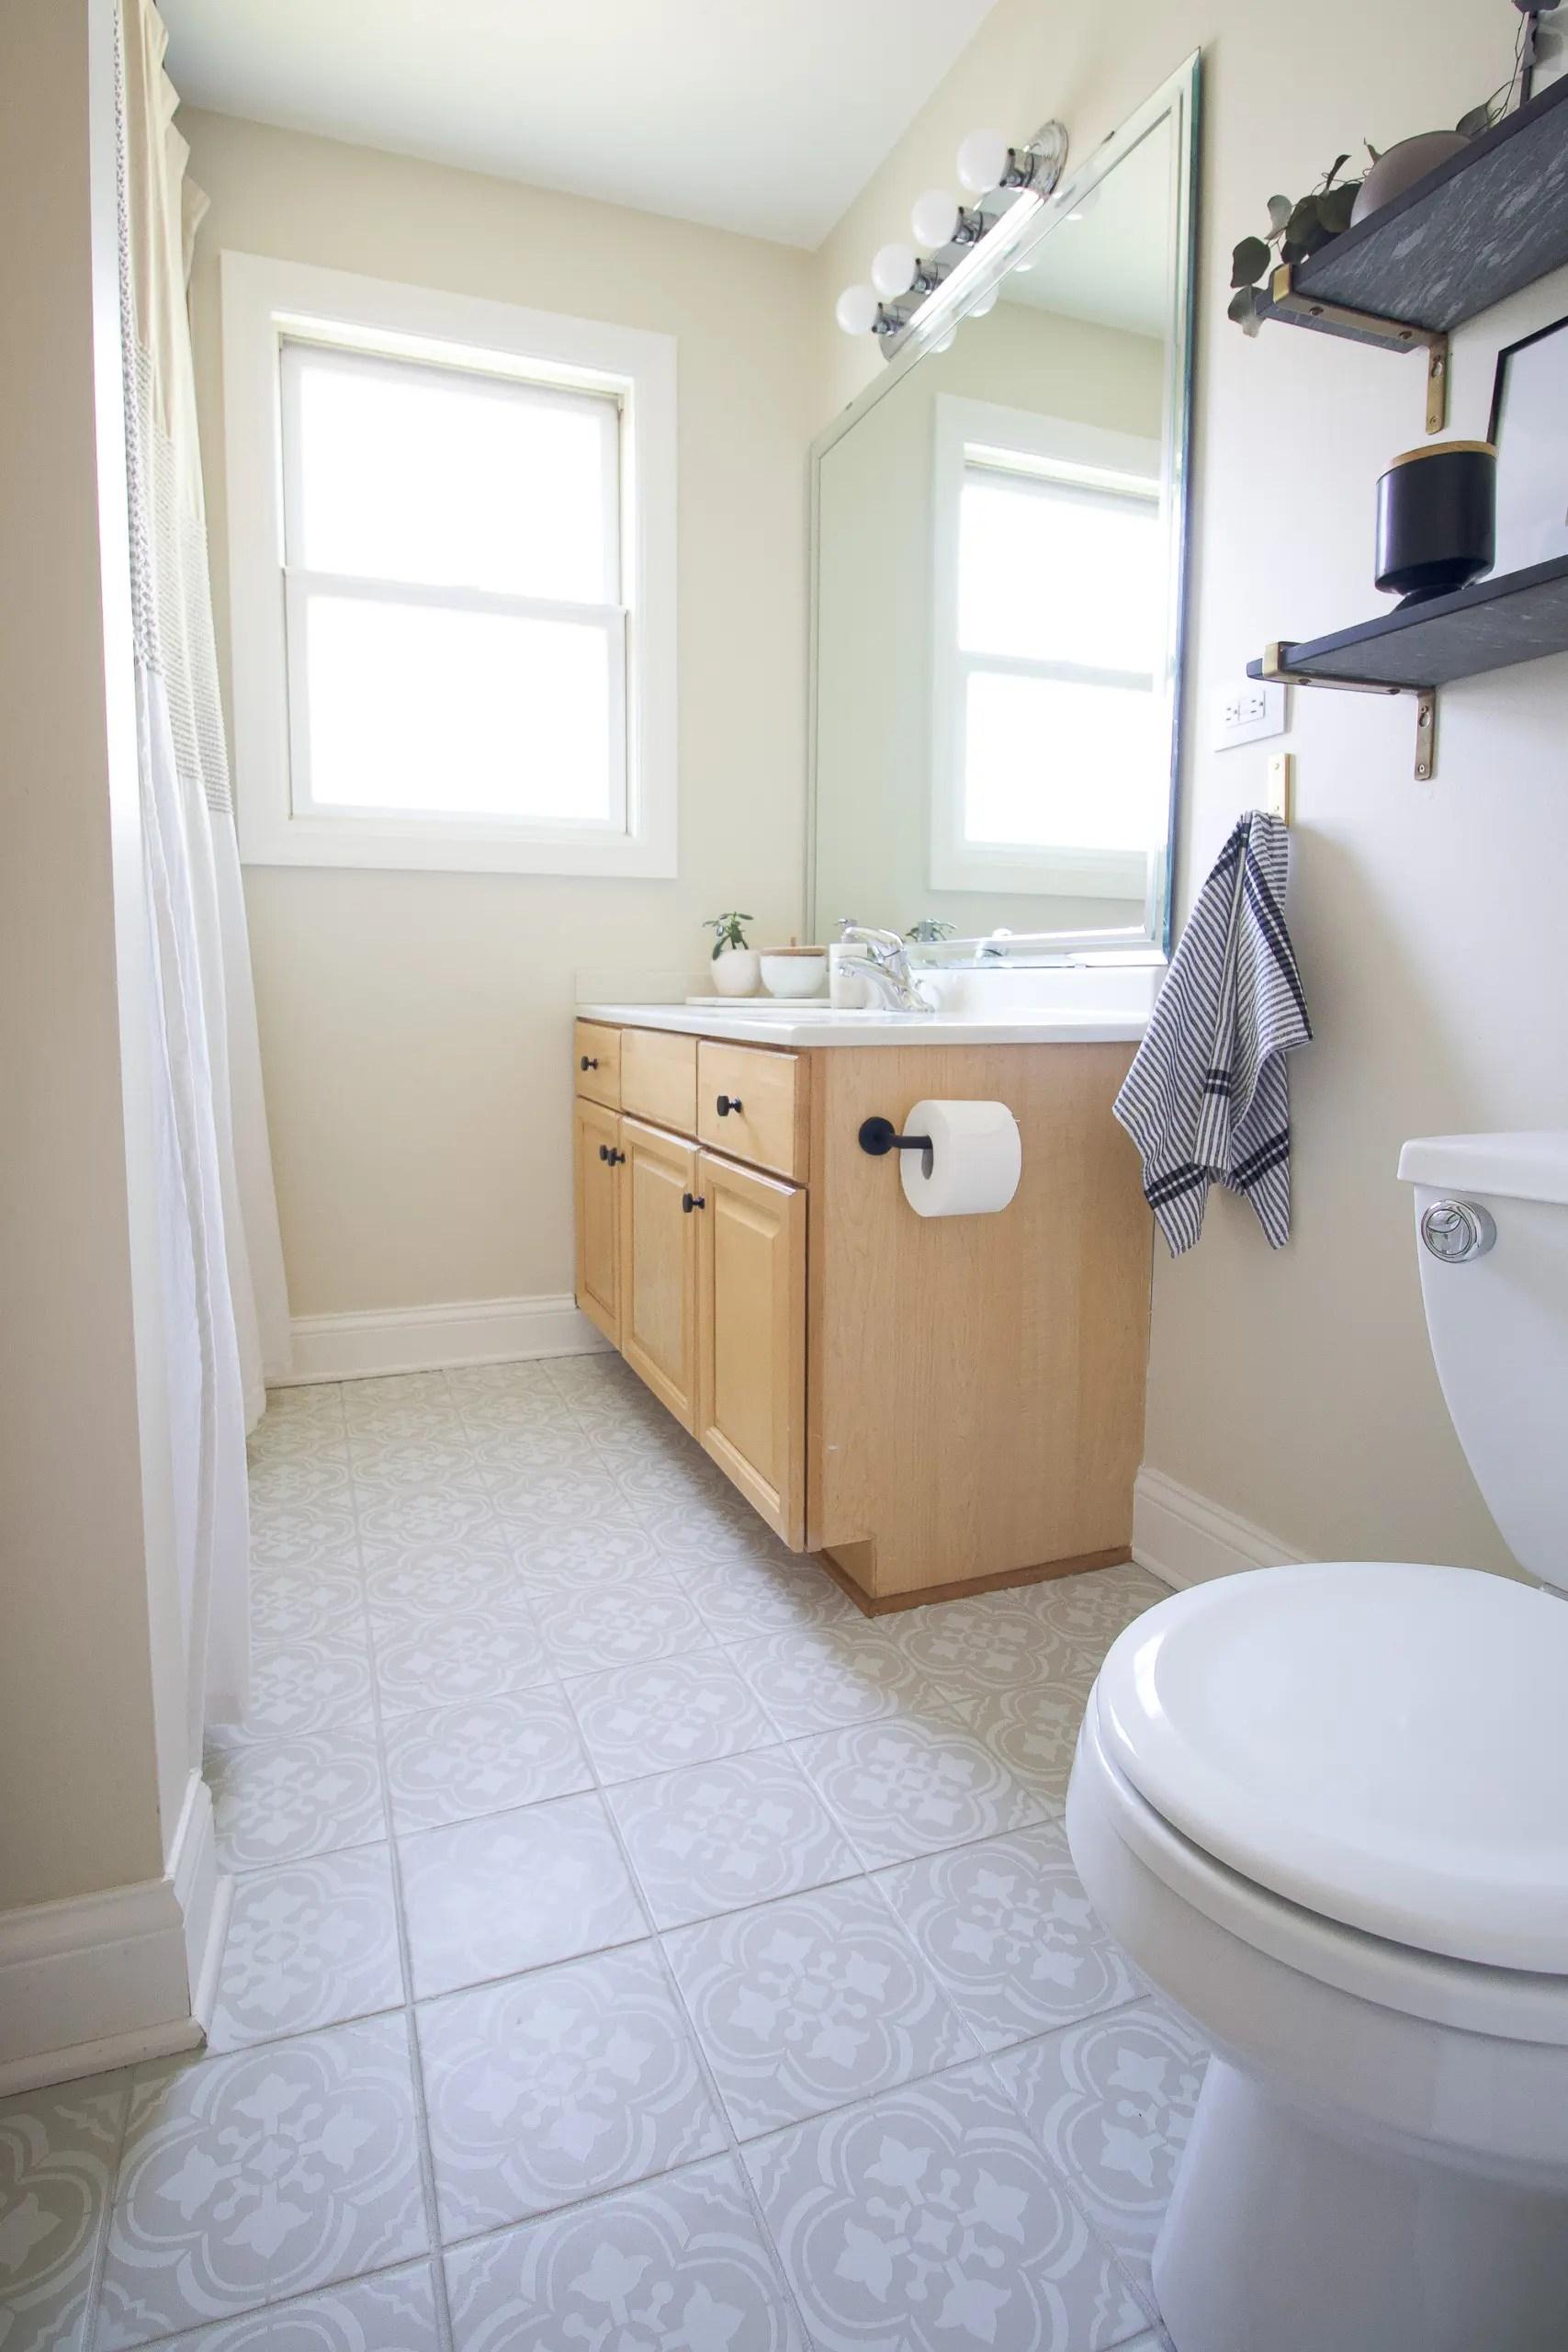 How To Paint A Bathroom Vanity The Diy Playbook